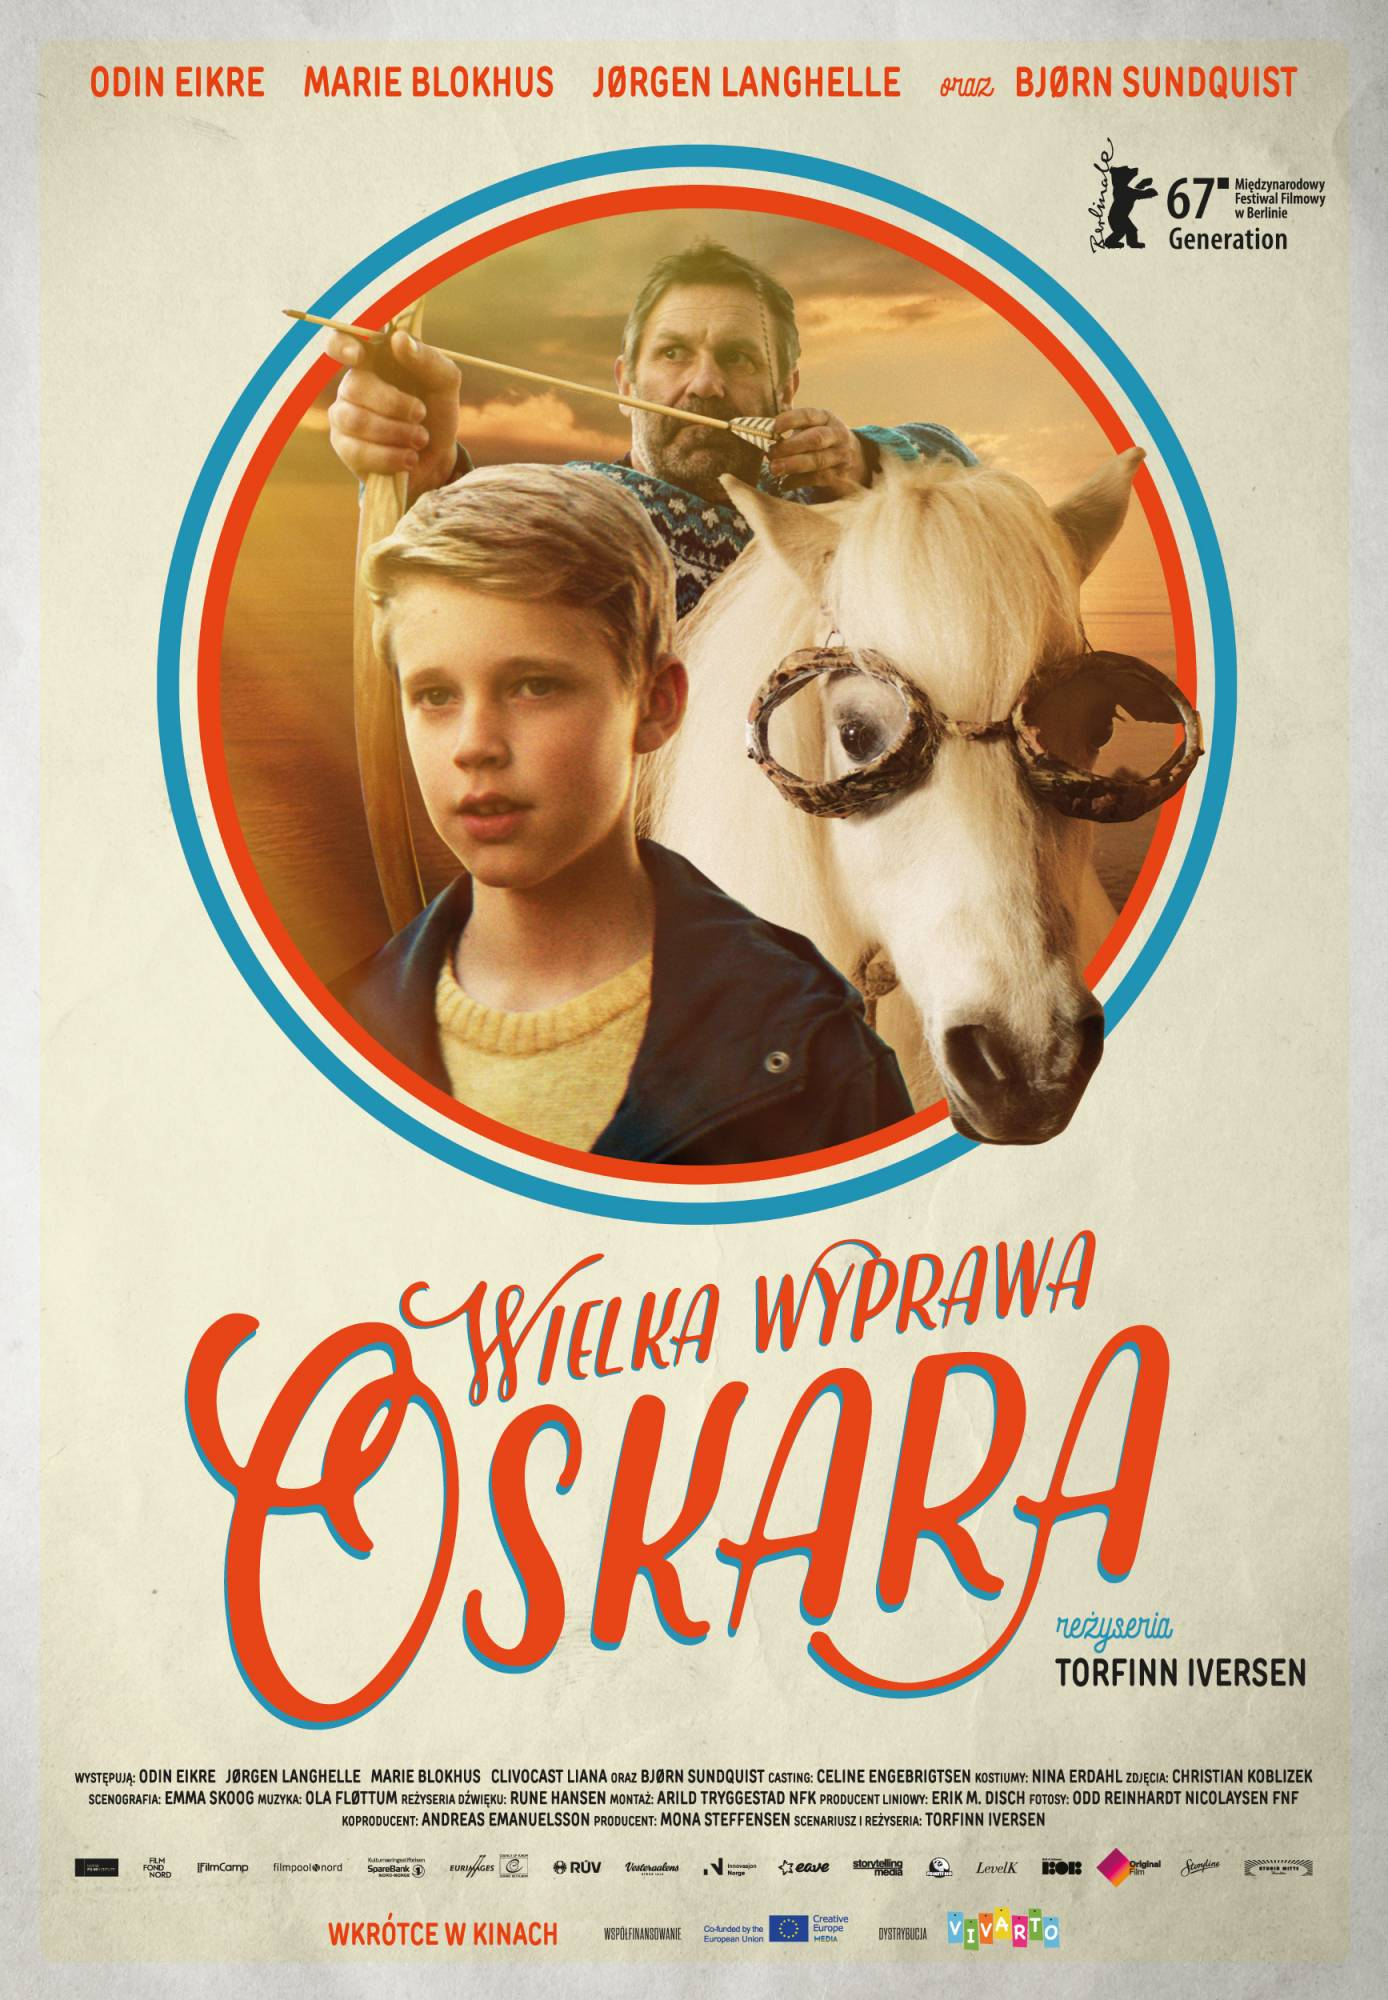 plakat_wielka-wyprawa-oskara_teaser.jpg